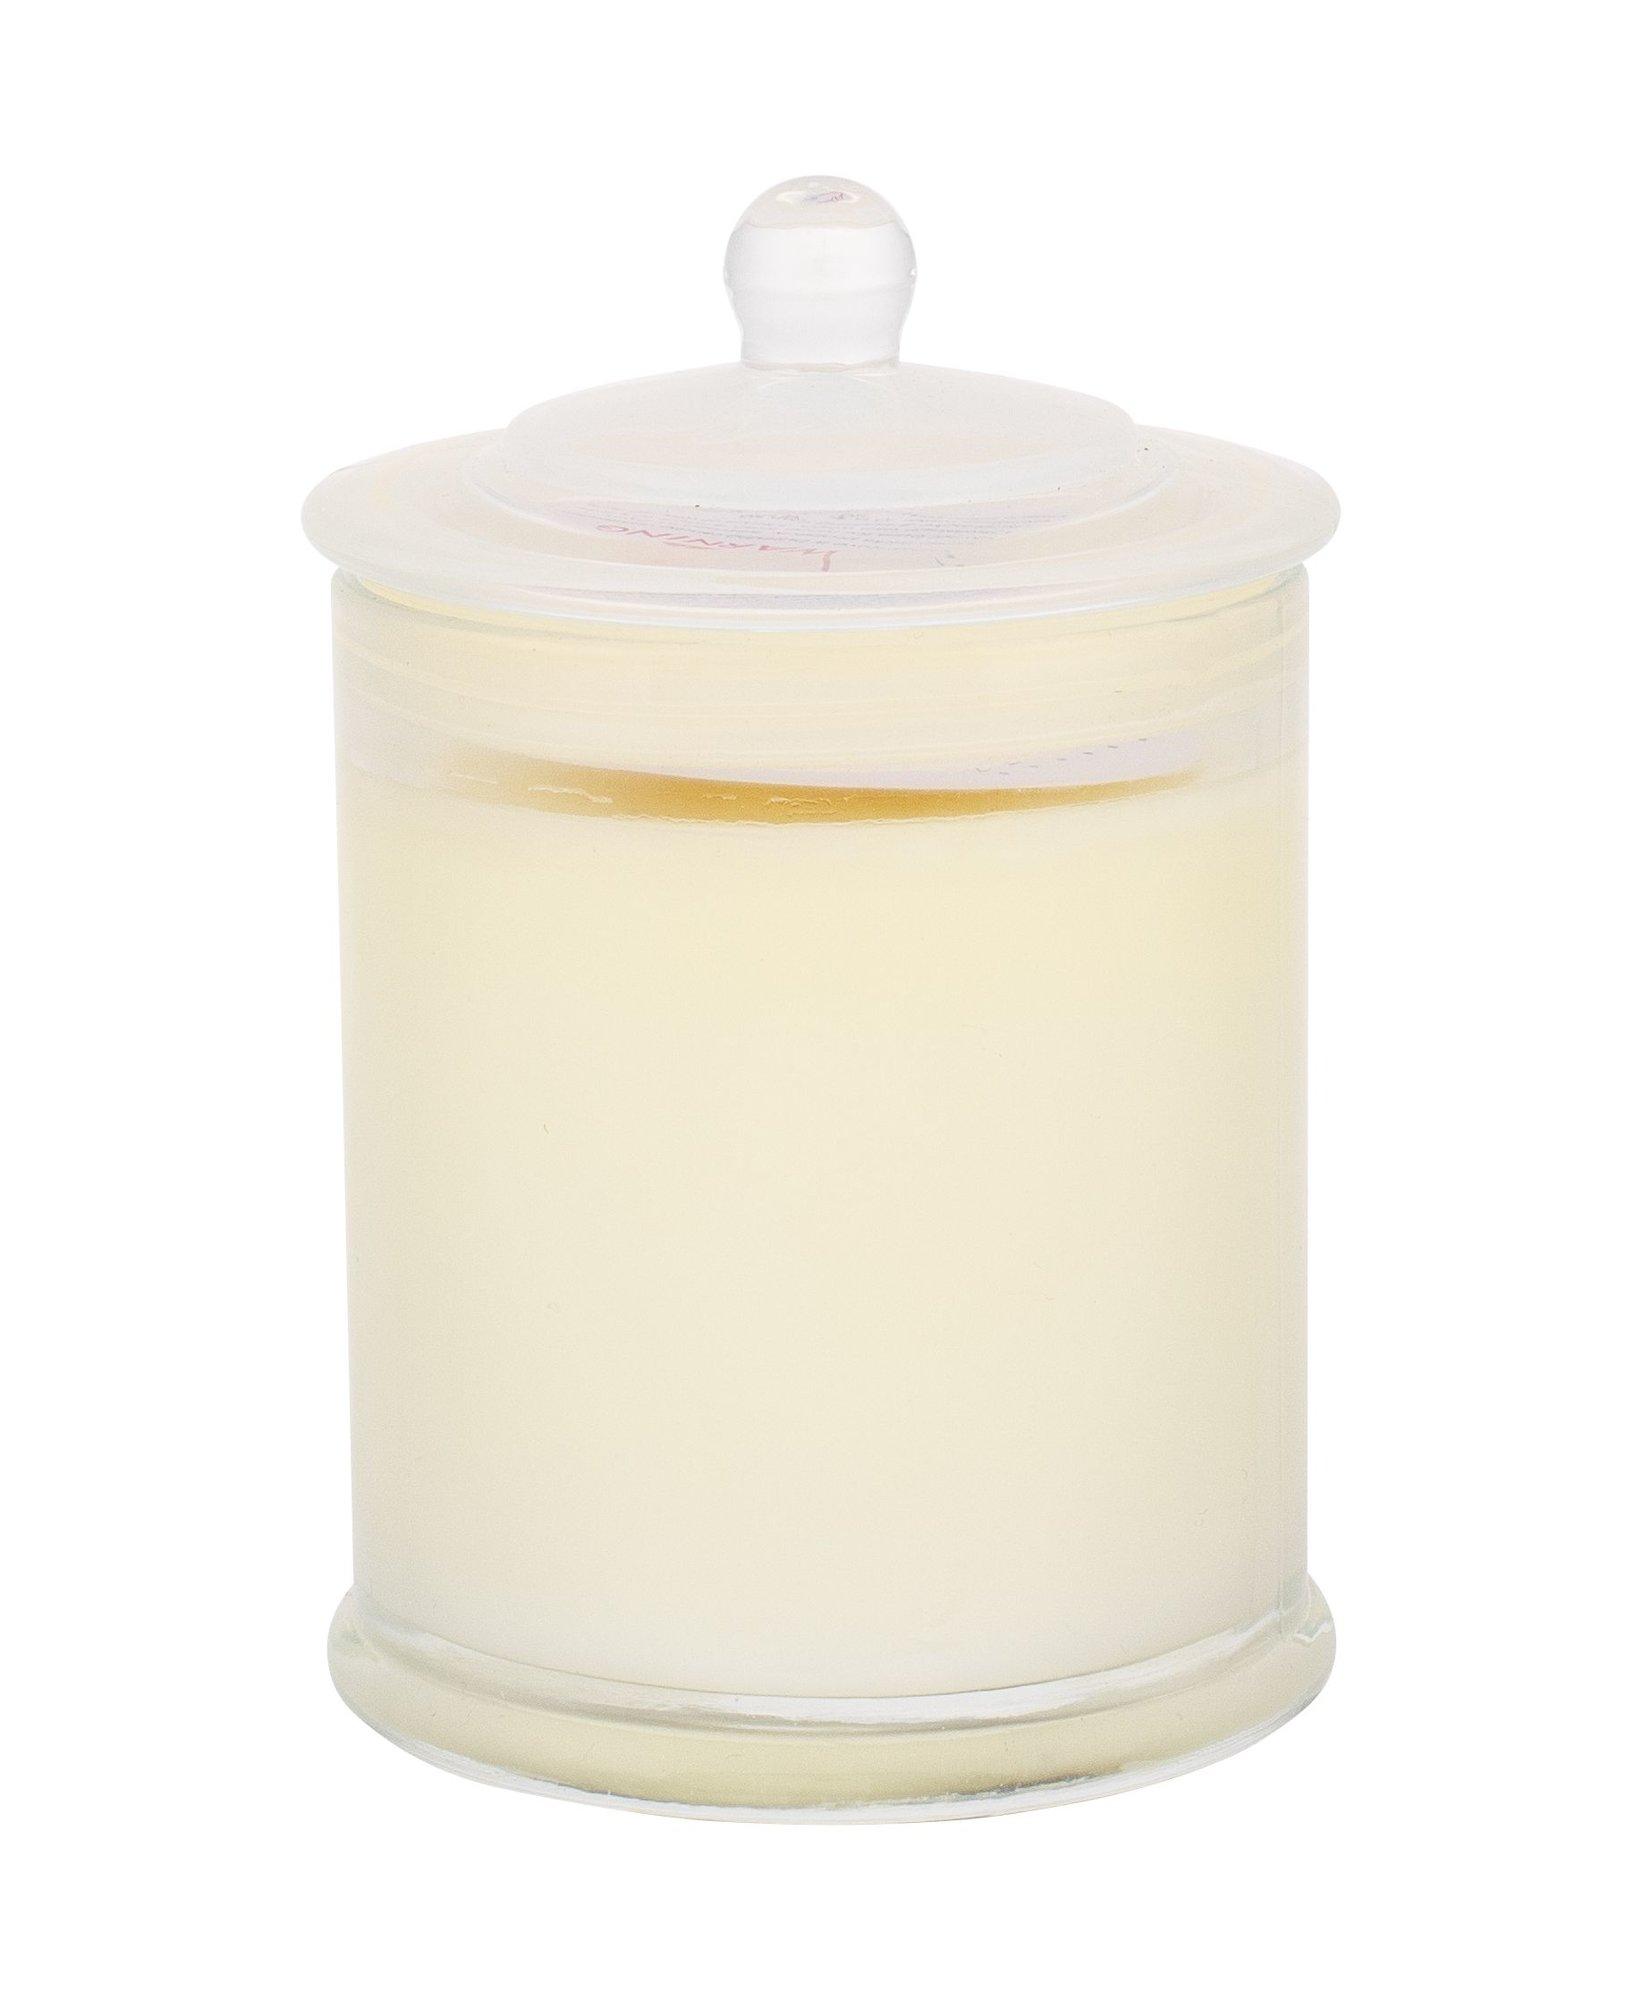 Glasshouse Positano Scented Candle 350ml